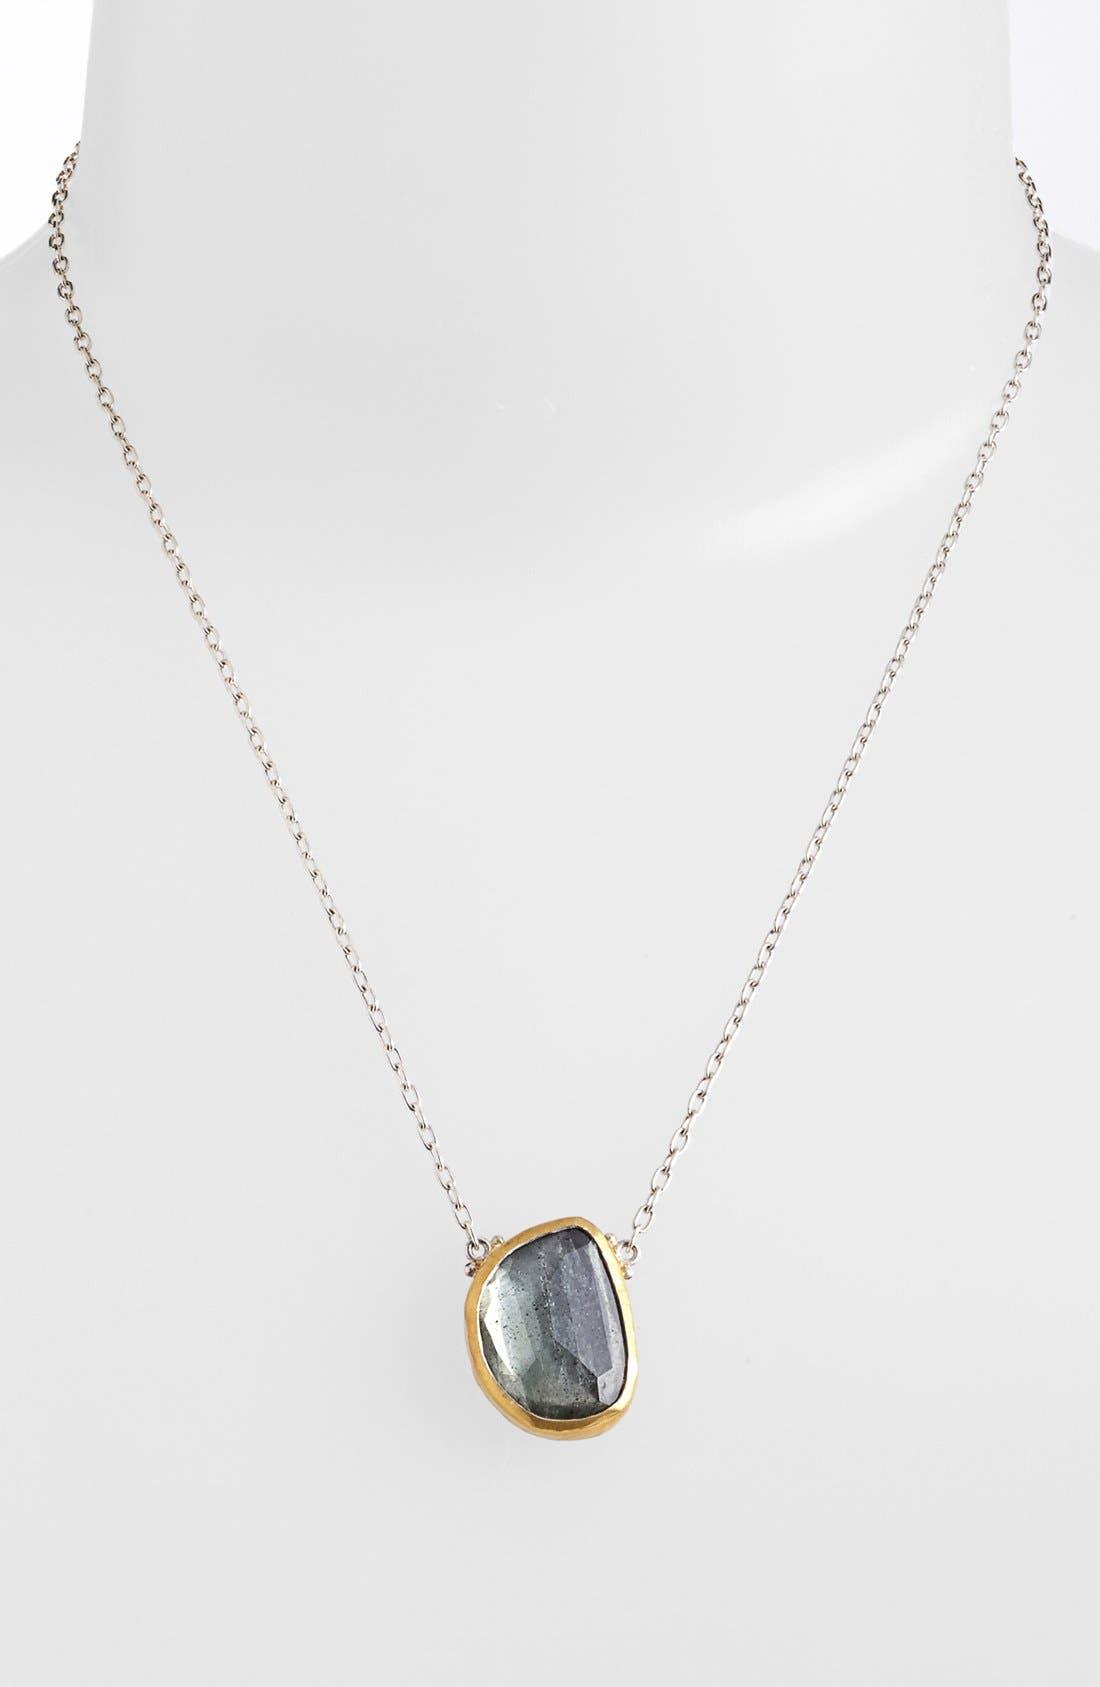 Alternate Image 1 Selected - Gurhan 'Elements' Moss Aquamarine Pendant Necklace